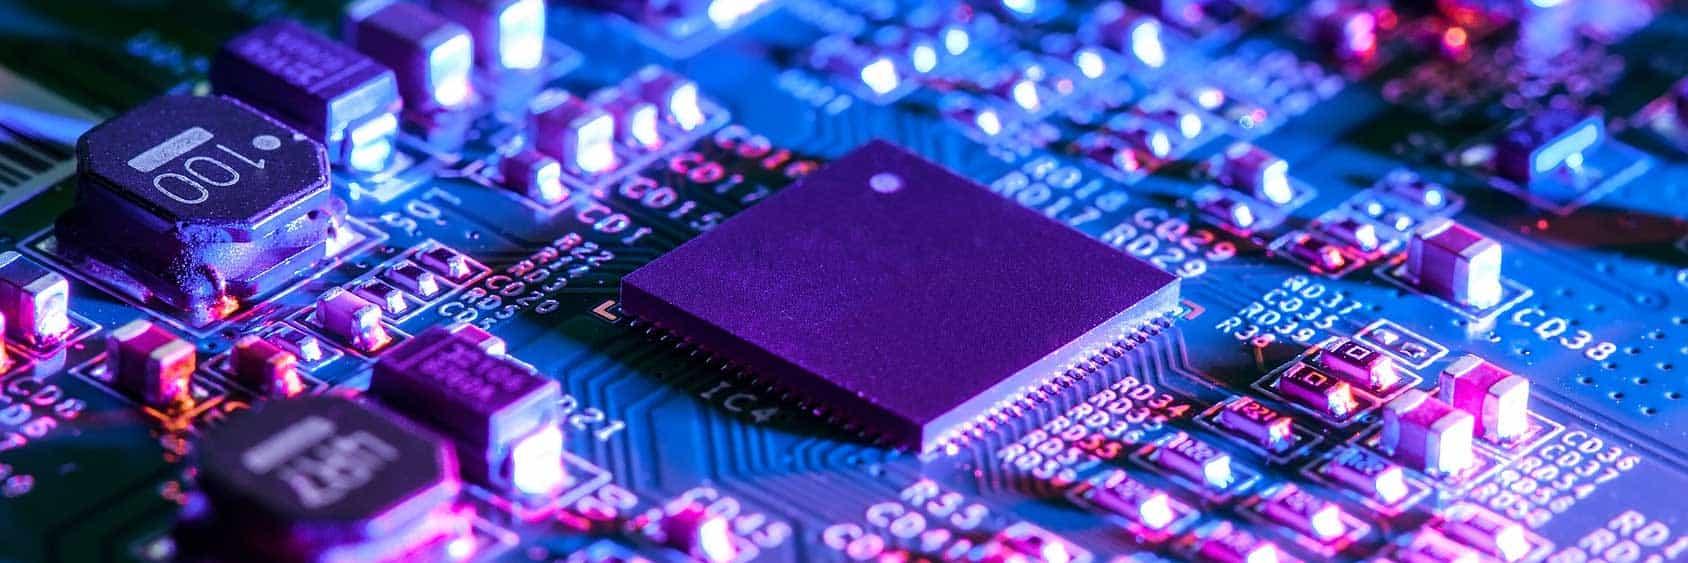 Electronics | Munro & Associates, Inc.